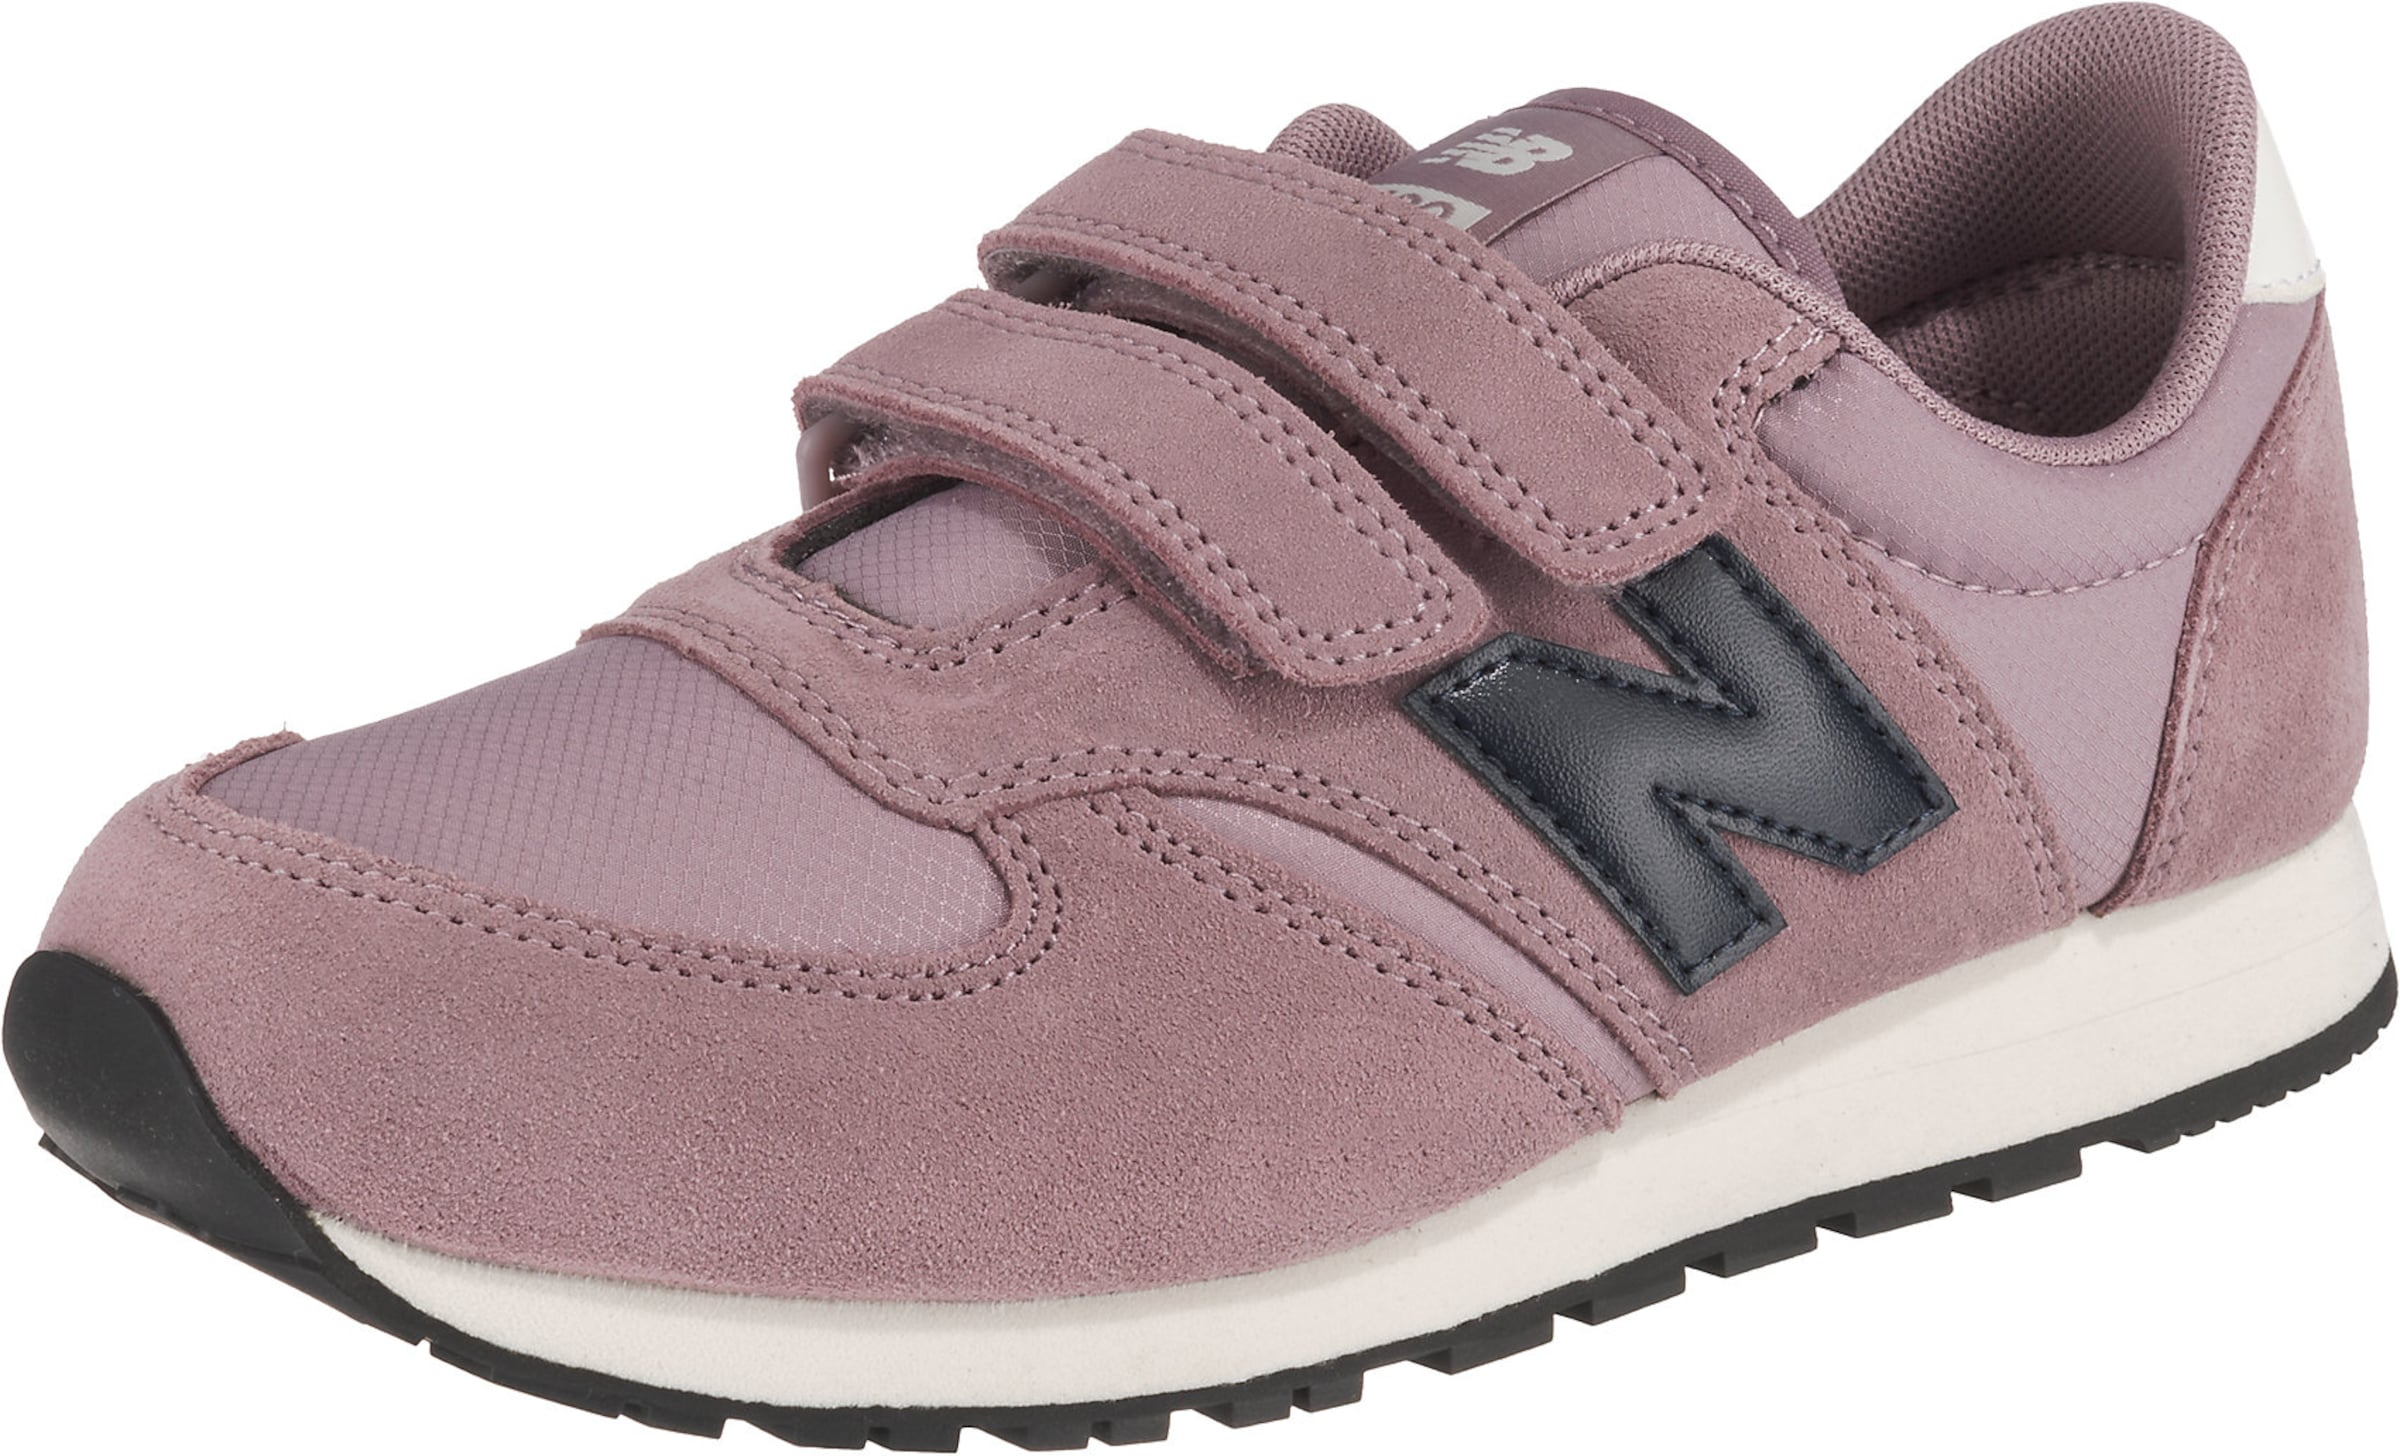 Kinder,  Mädchen,  Kinder New Balance Sneakers rot, schwarz | 00193362184232